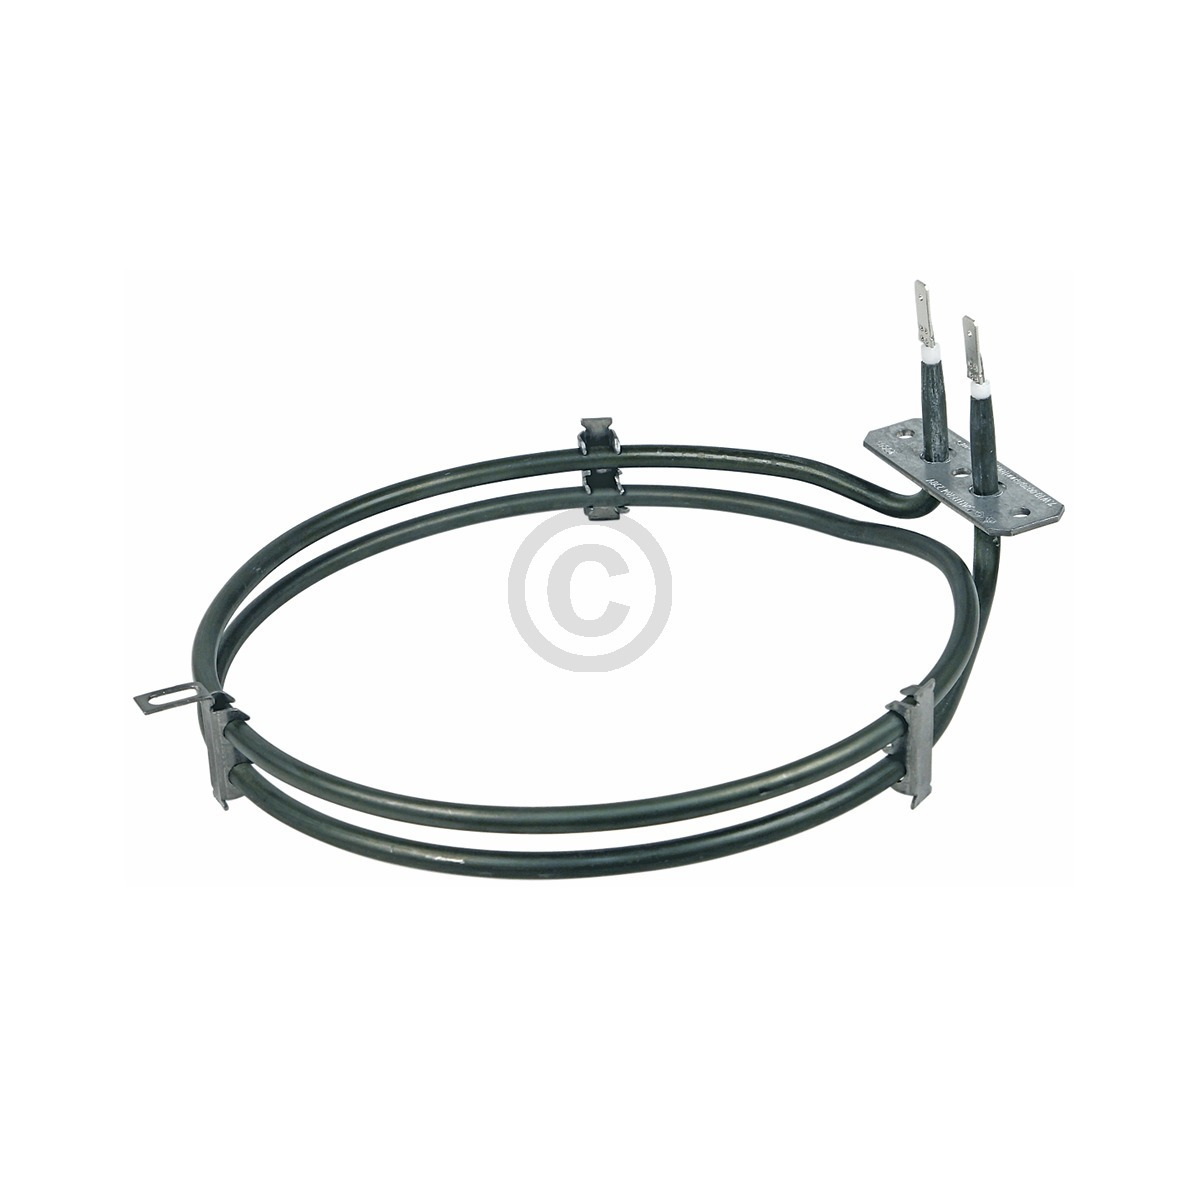 Heizelement Heißluft 2000W 230V 480121101186 Bauknecht, Whirlpool, Ikea